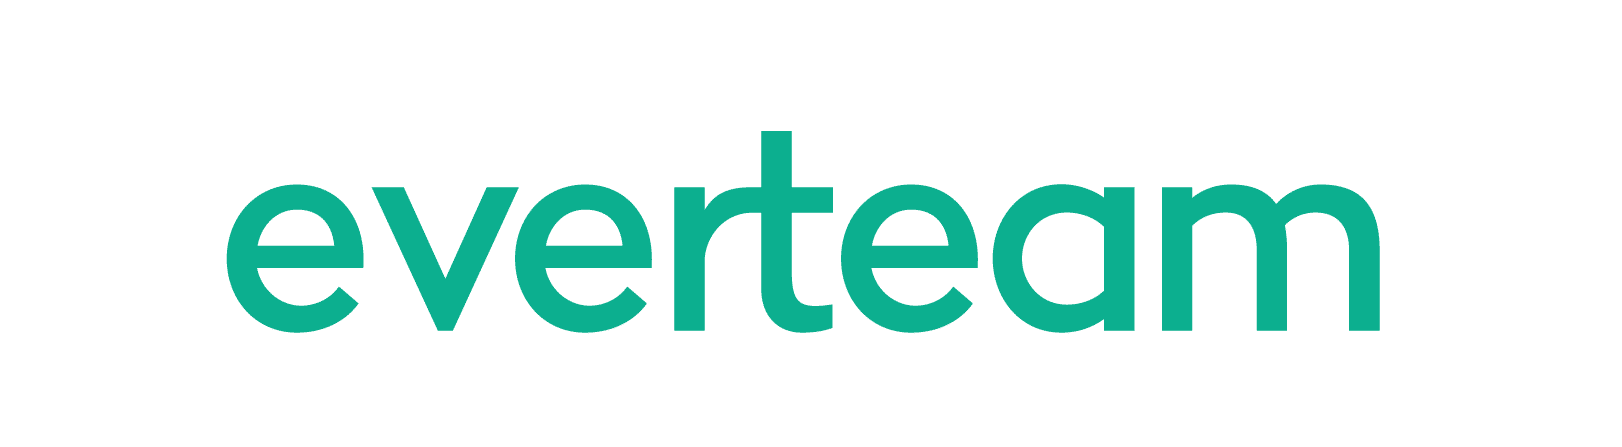 everteam-logo